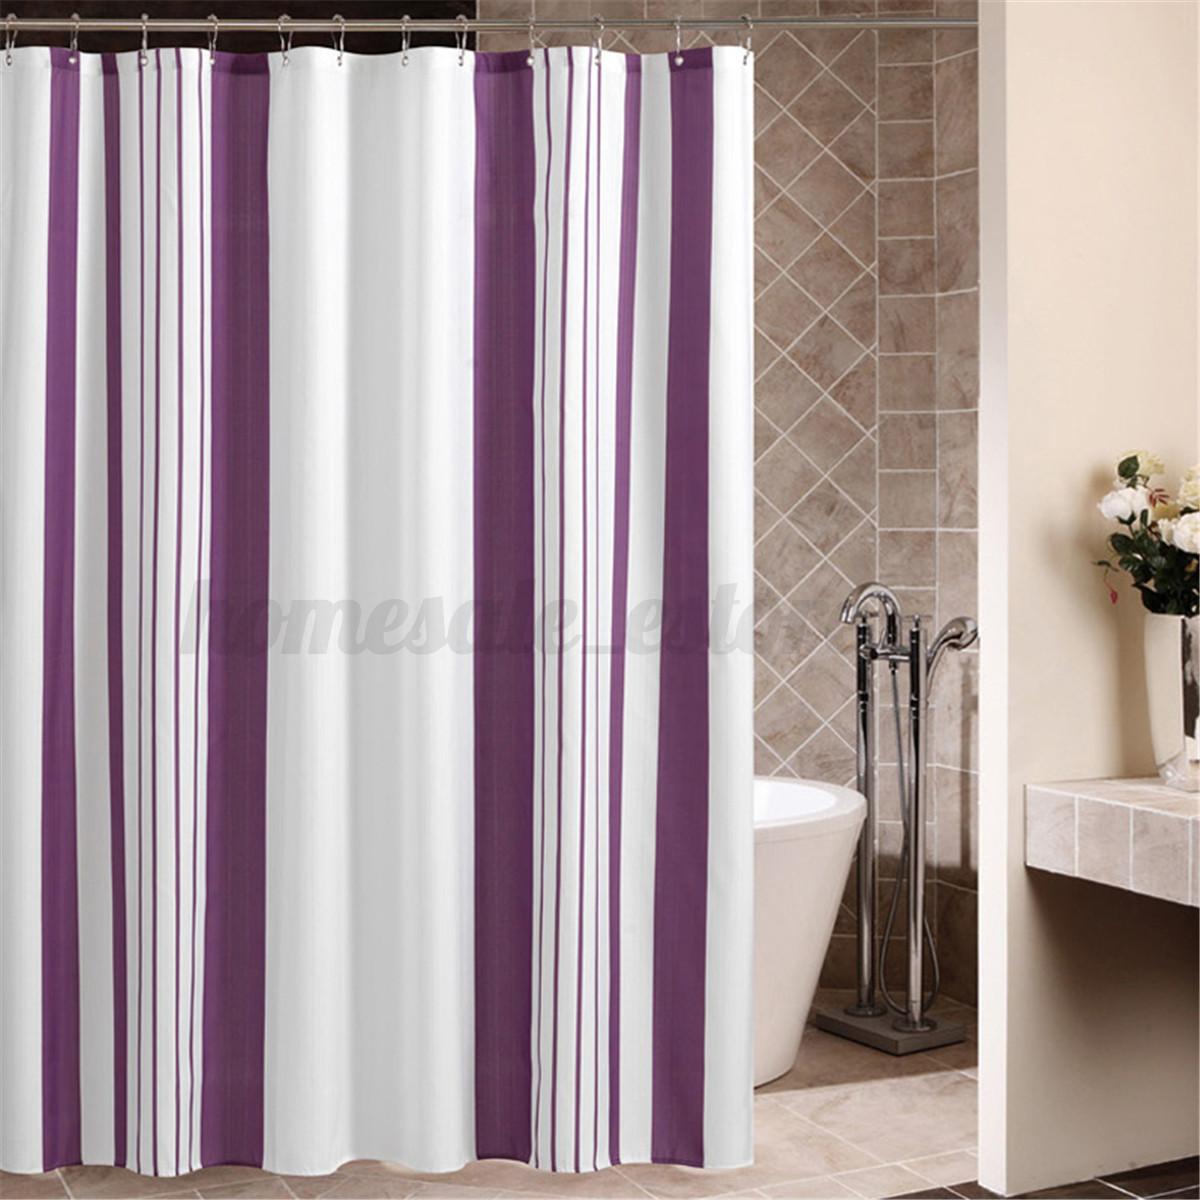 Various modern waterproof bathroom shower curtain panel for File f bathroom